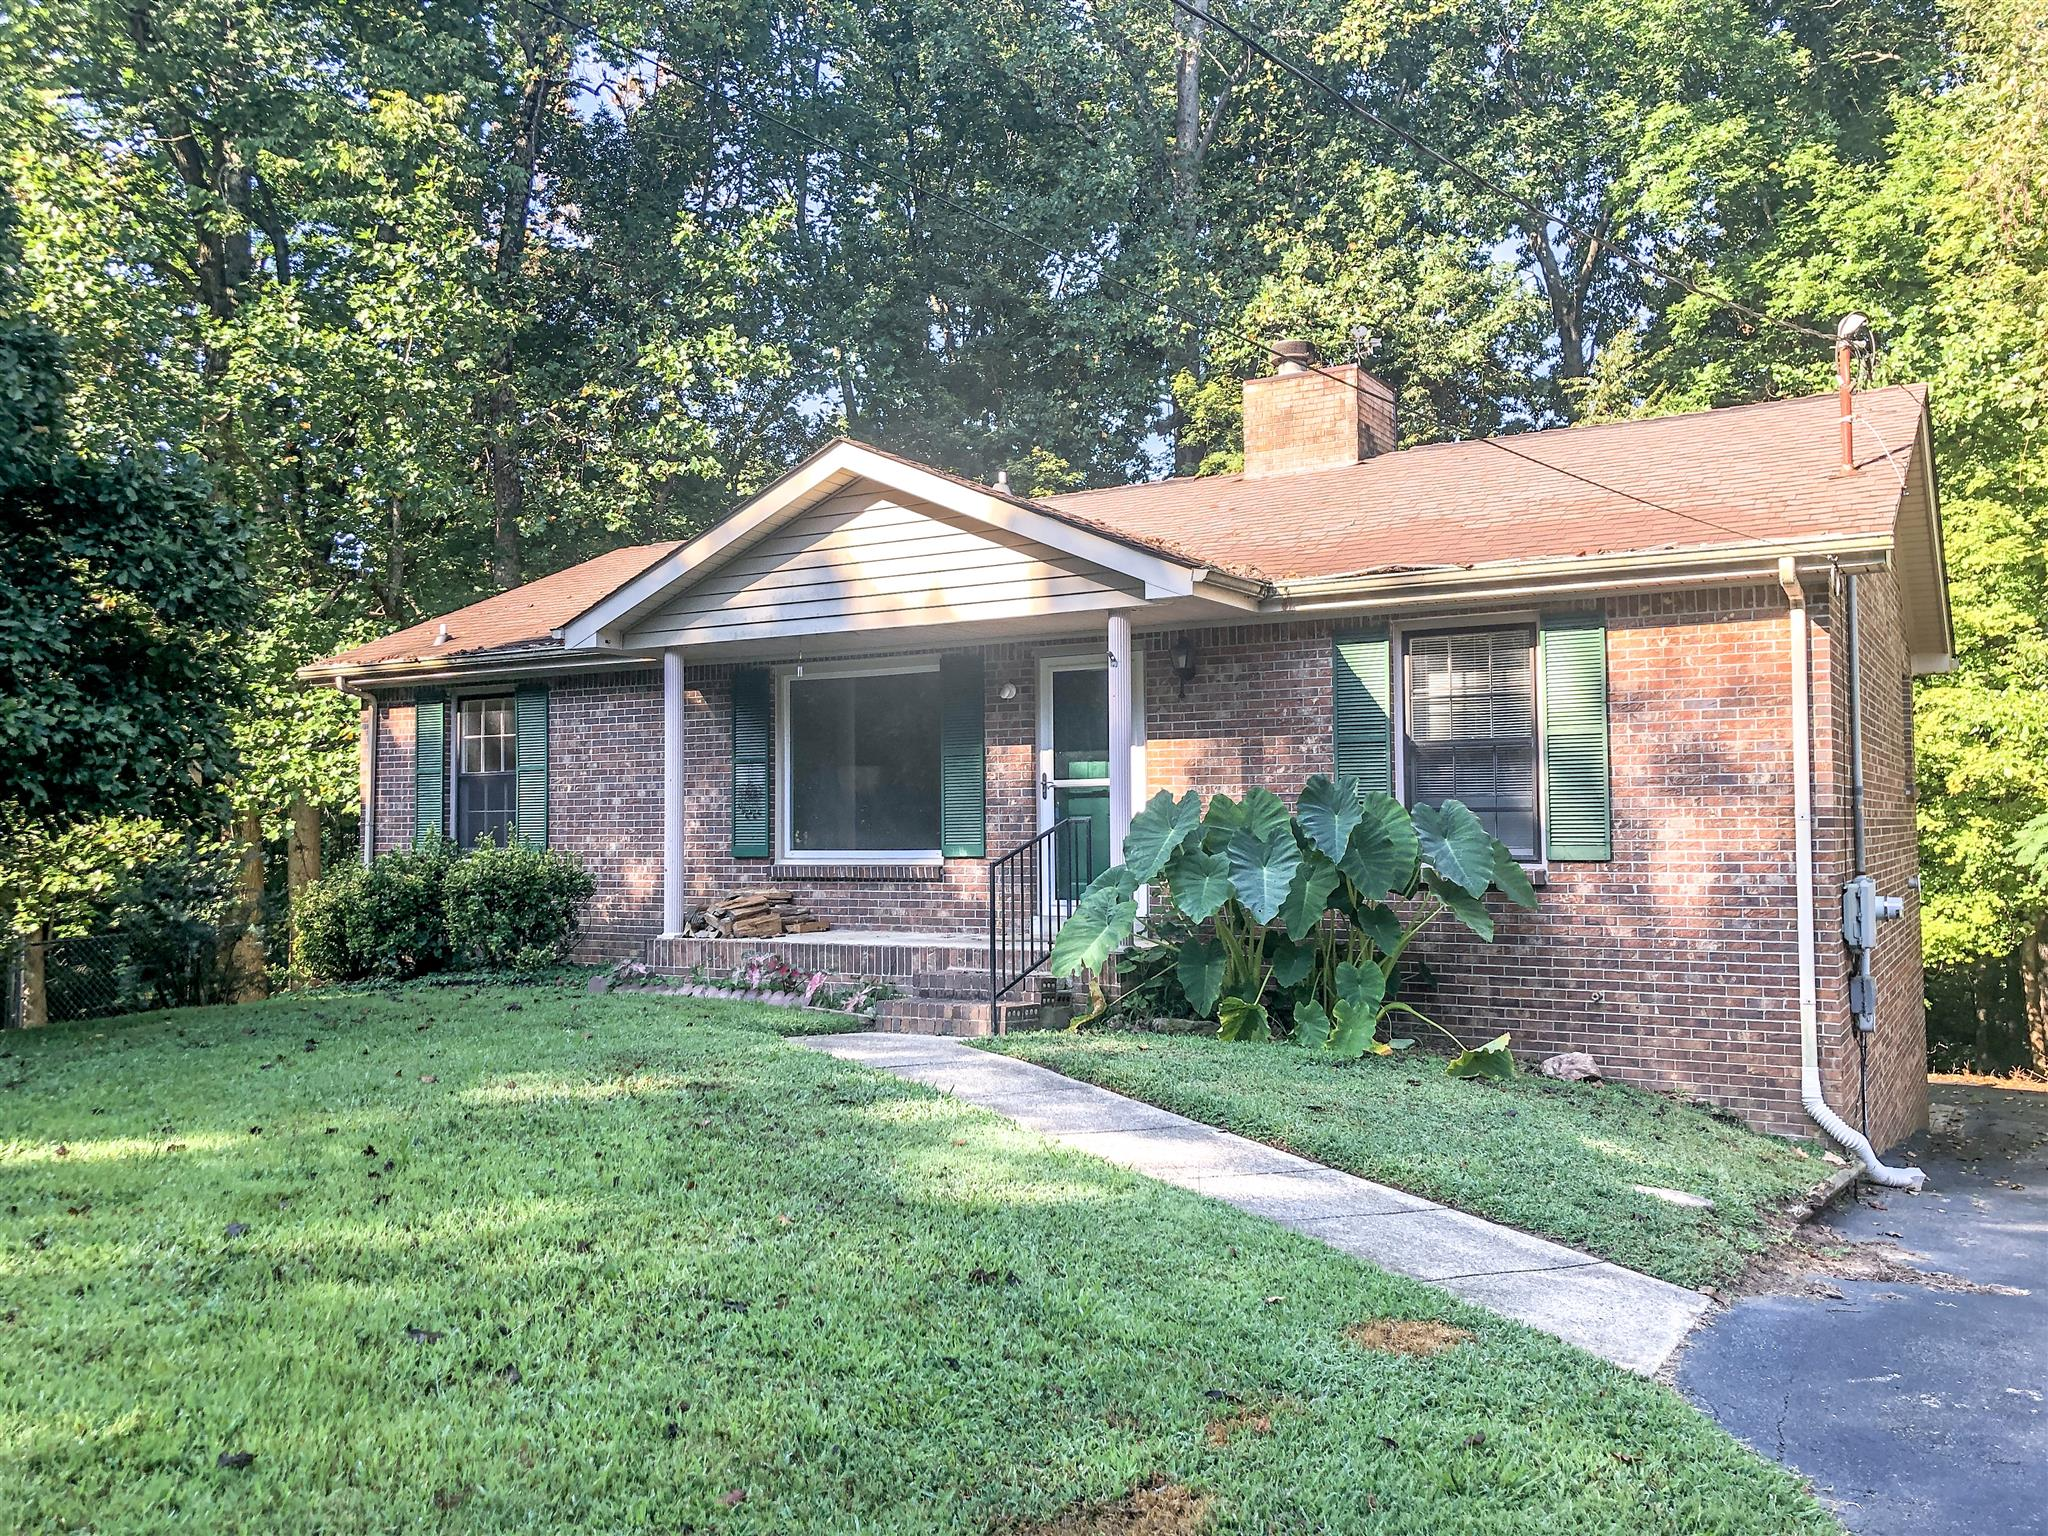 139 Ledbetter Ln, Clarksville, TN 37043 - Clarksville, TN real estate listing